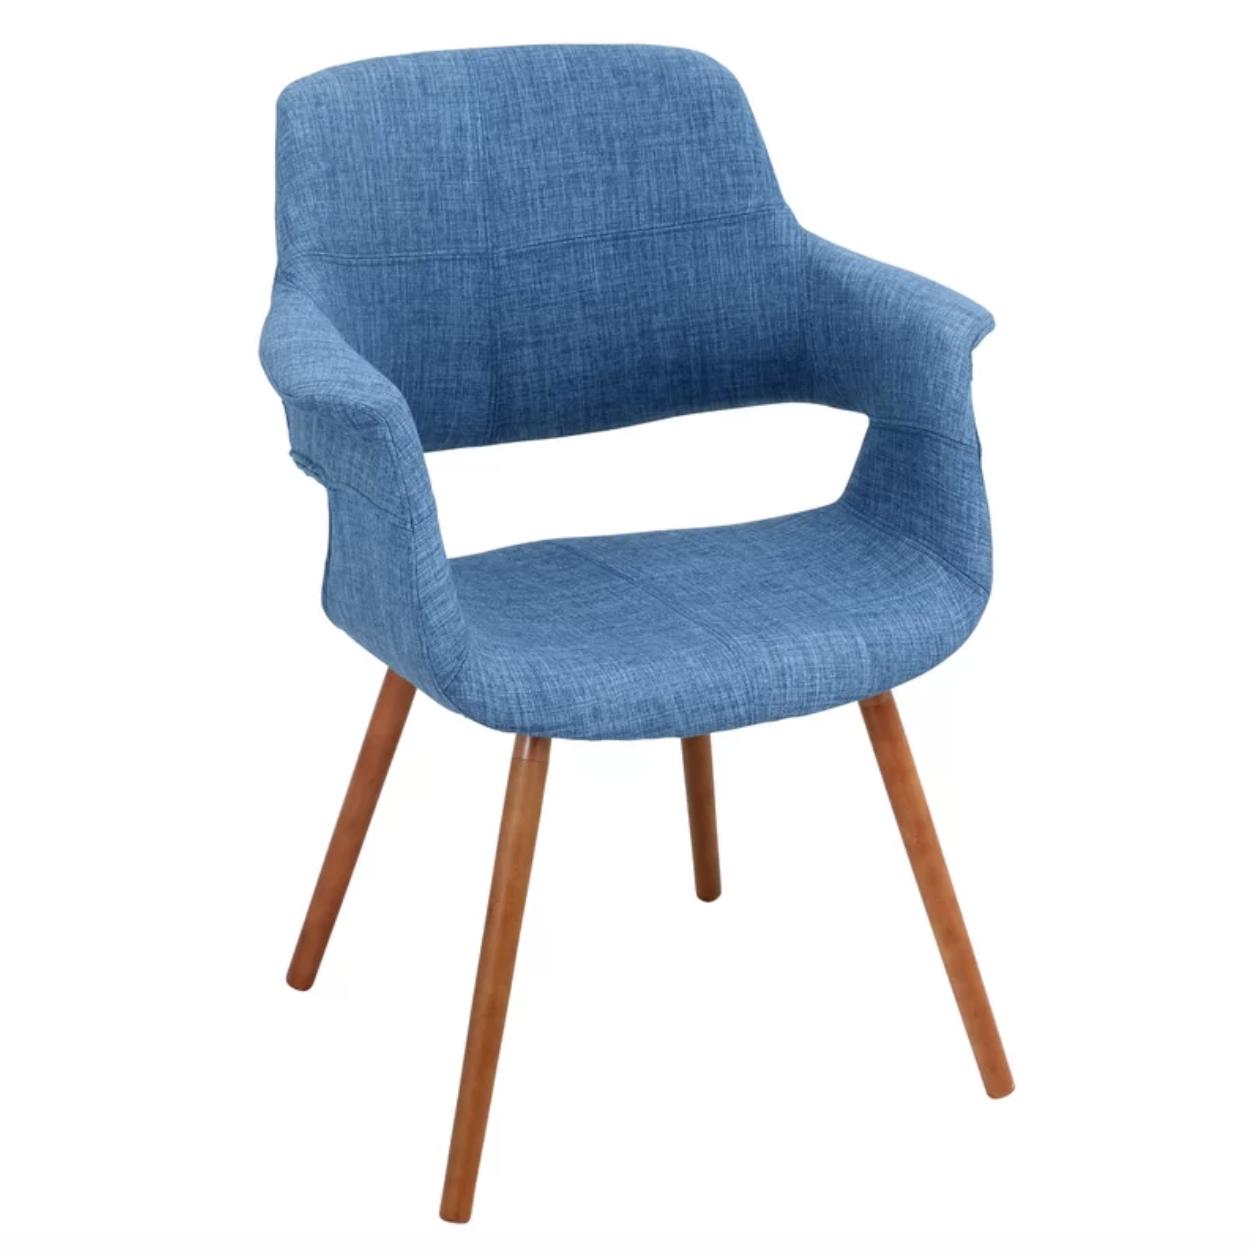 Joss & Main Frederick Upholstered Dining Chair - $149